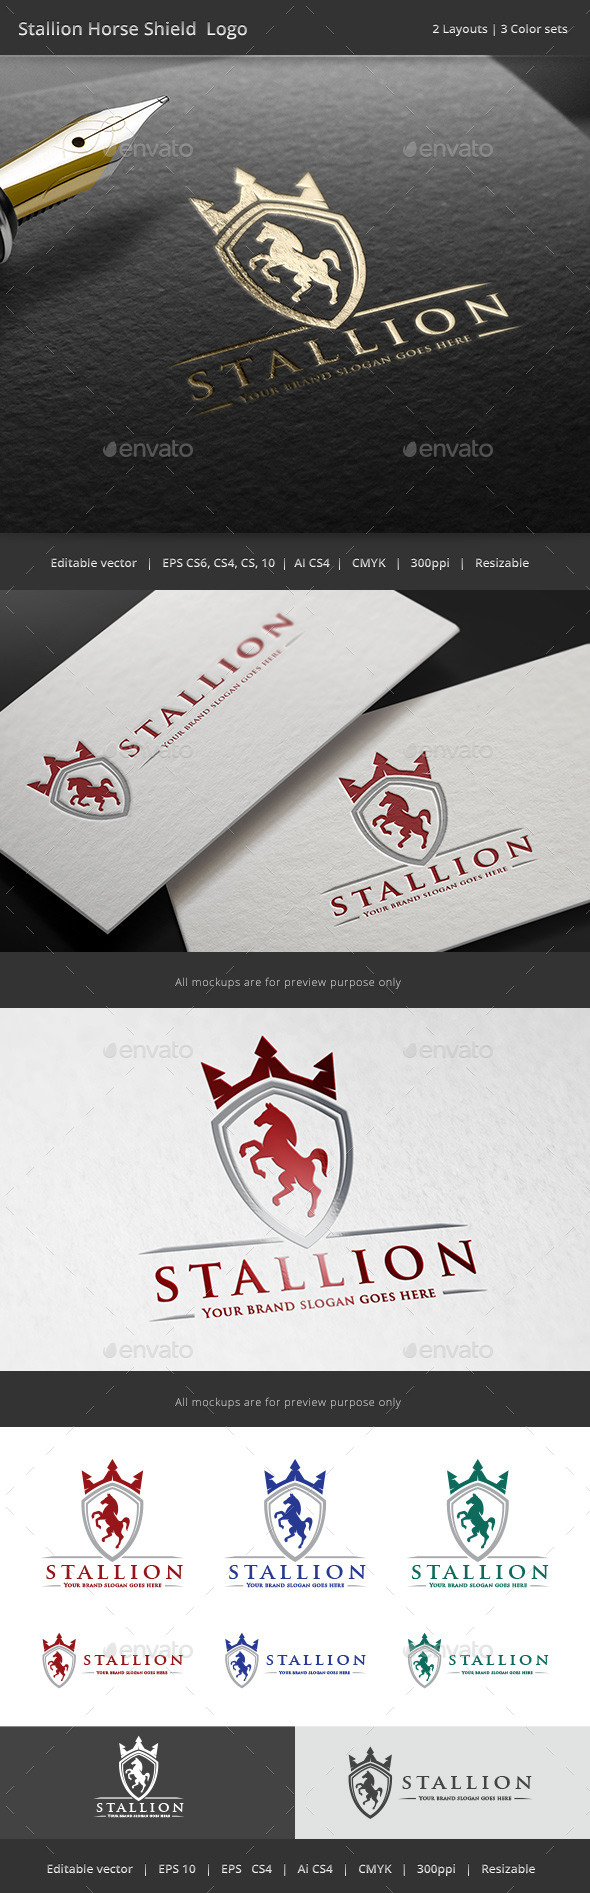 GraphicRiver Stallion Horse Shield Crest Logo 11212129